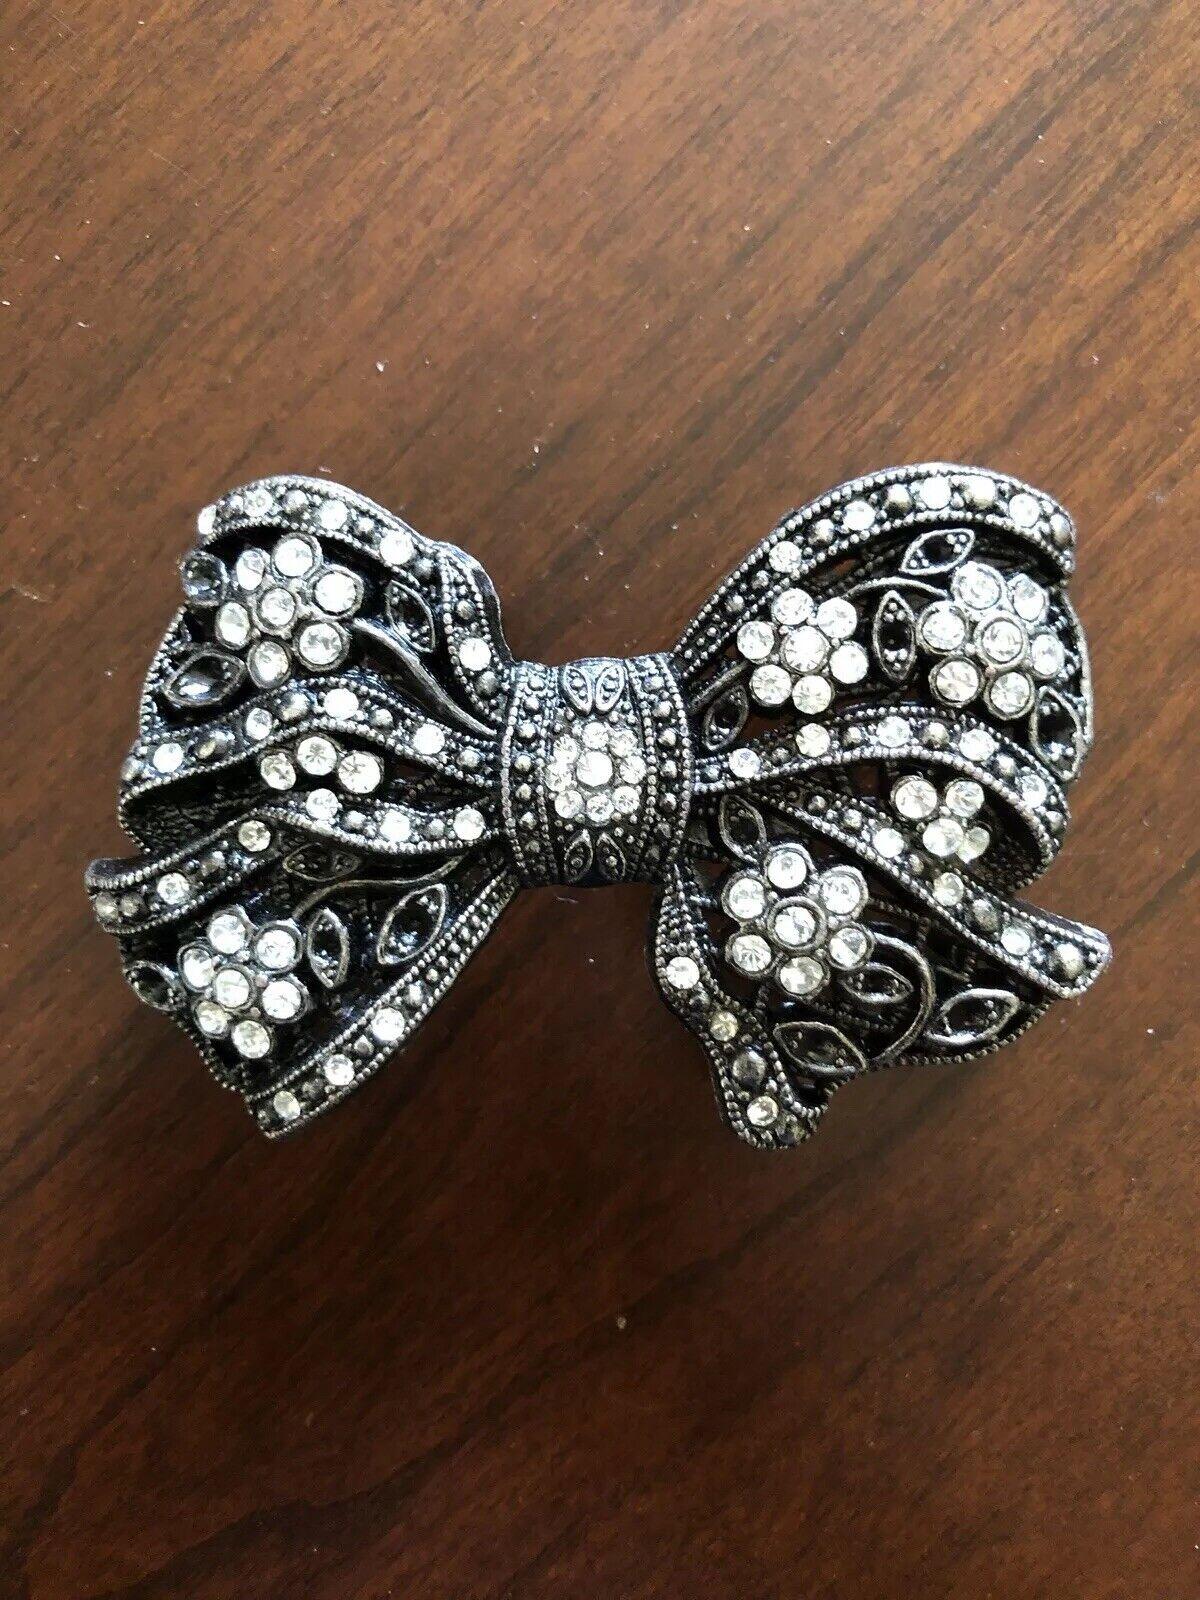 White Rhinestone Stylish Classy Fashion Bow Tie Metal Women's Belt Buckle